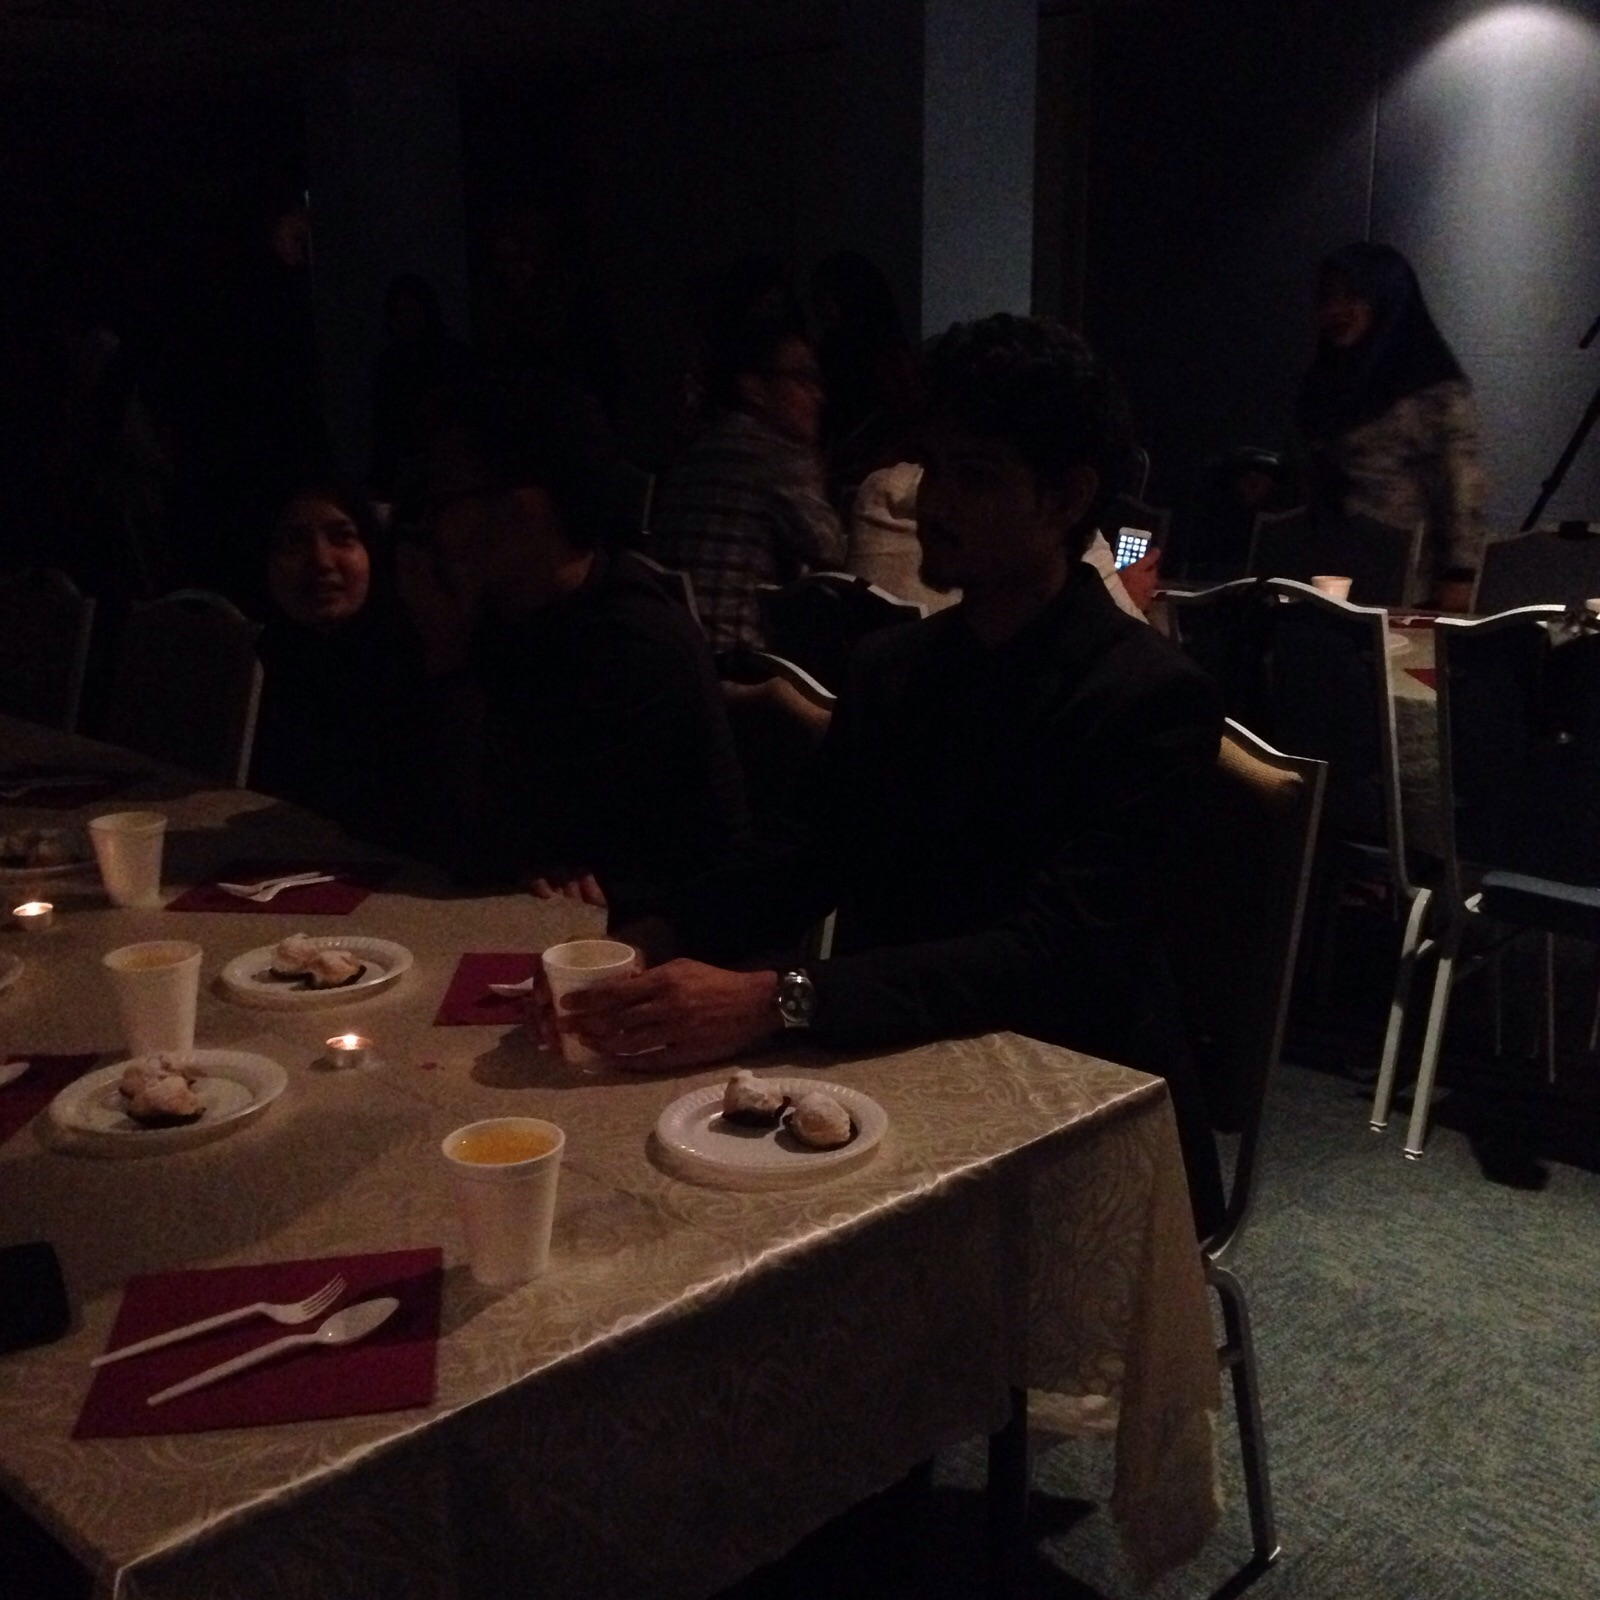 dans le noir table setting in the dark